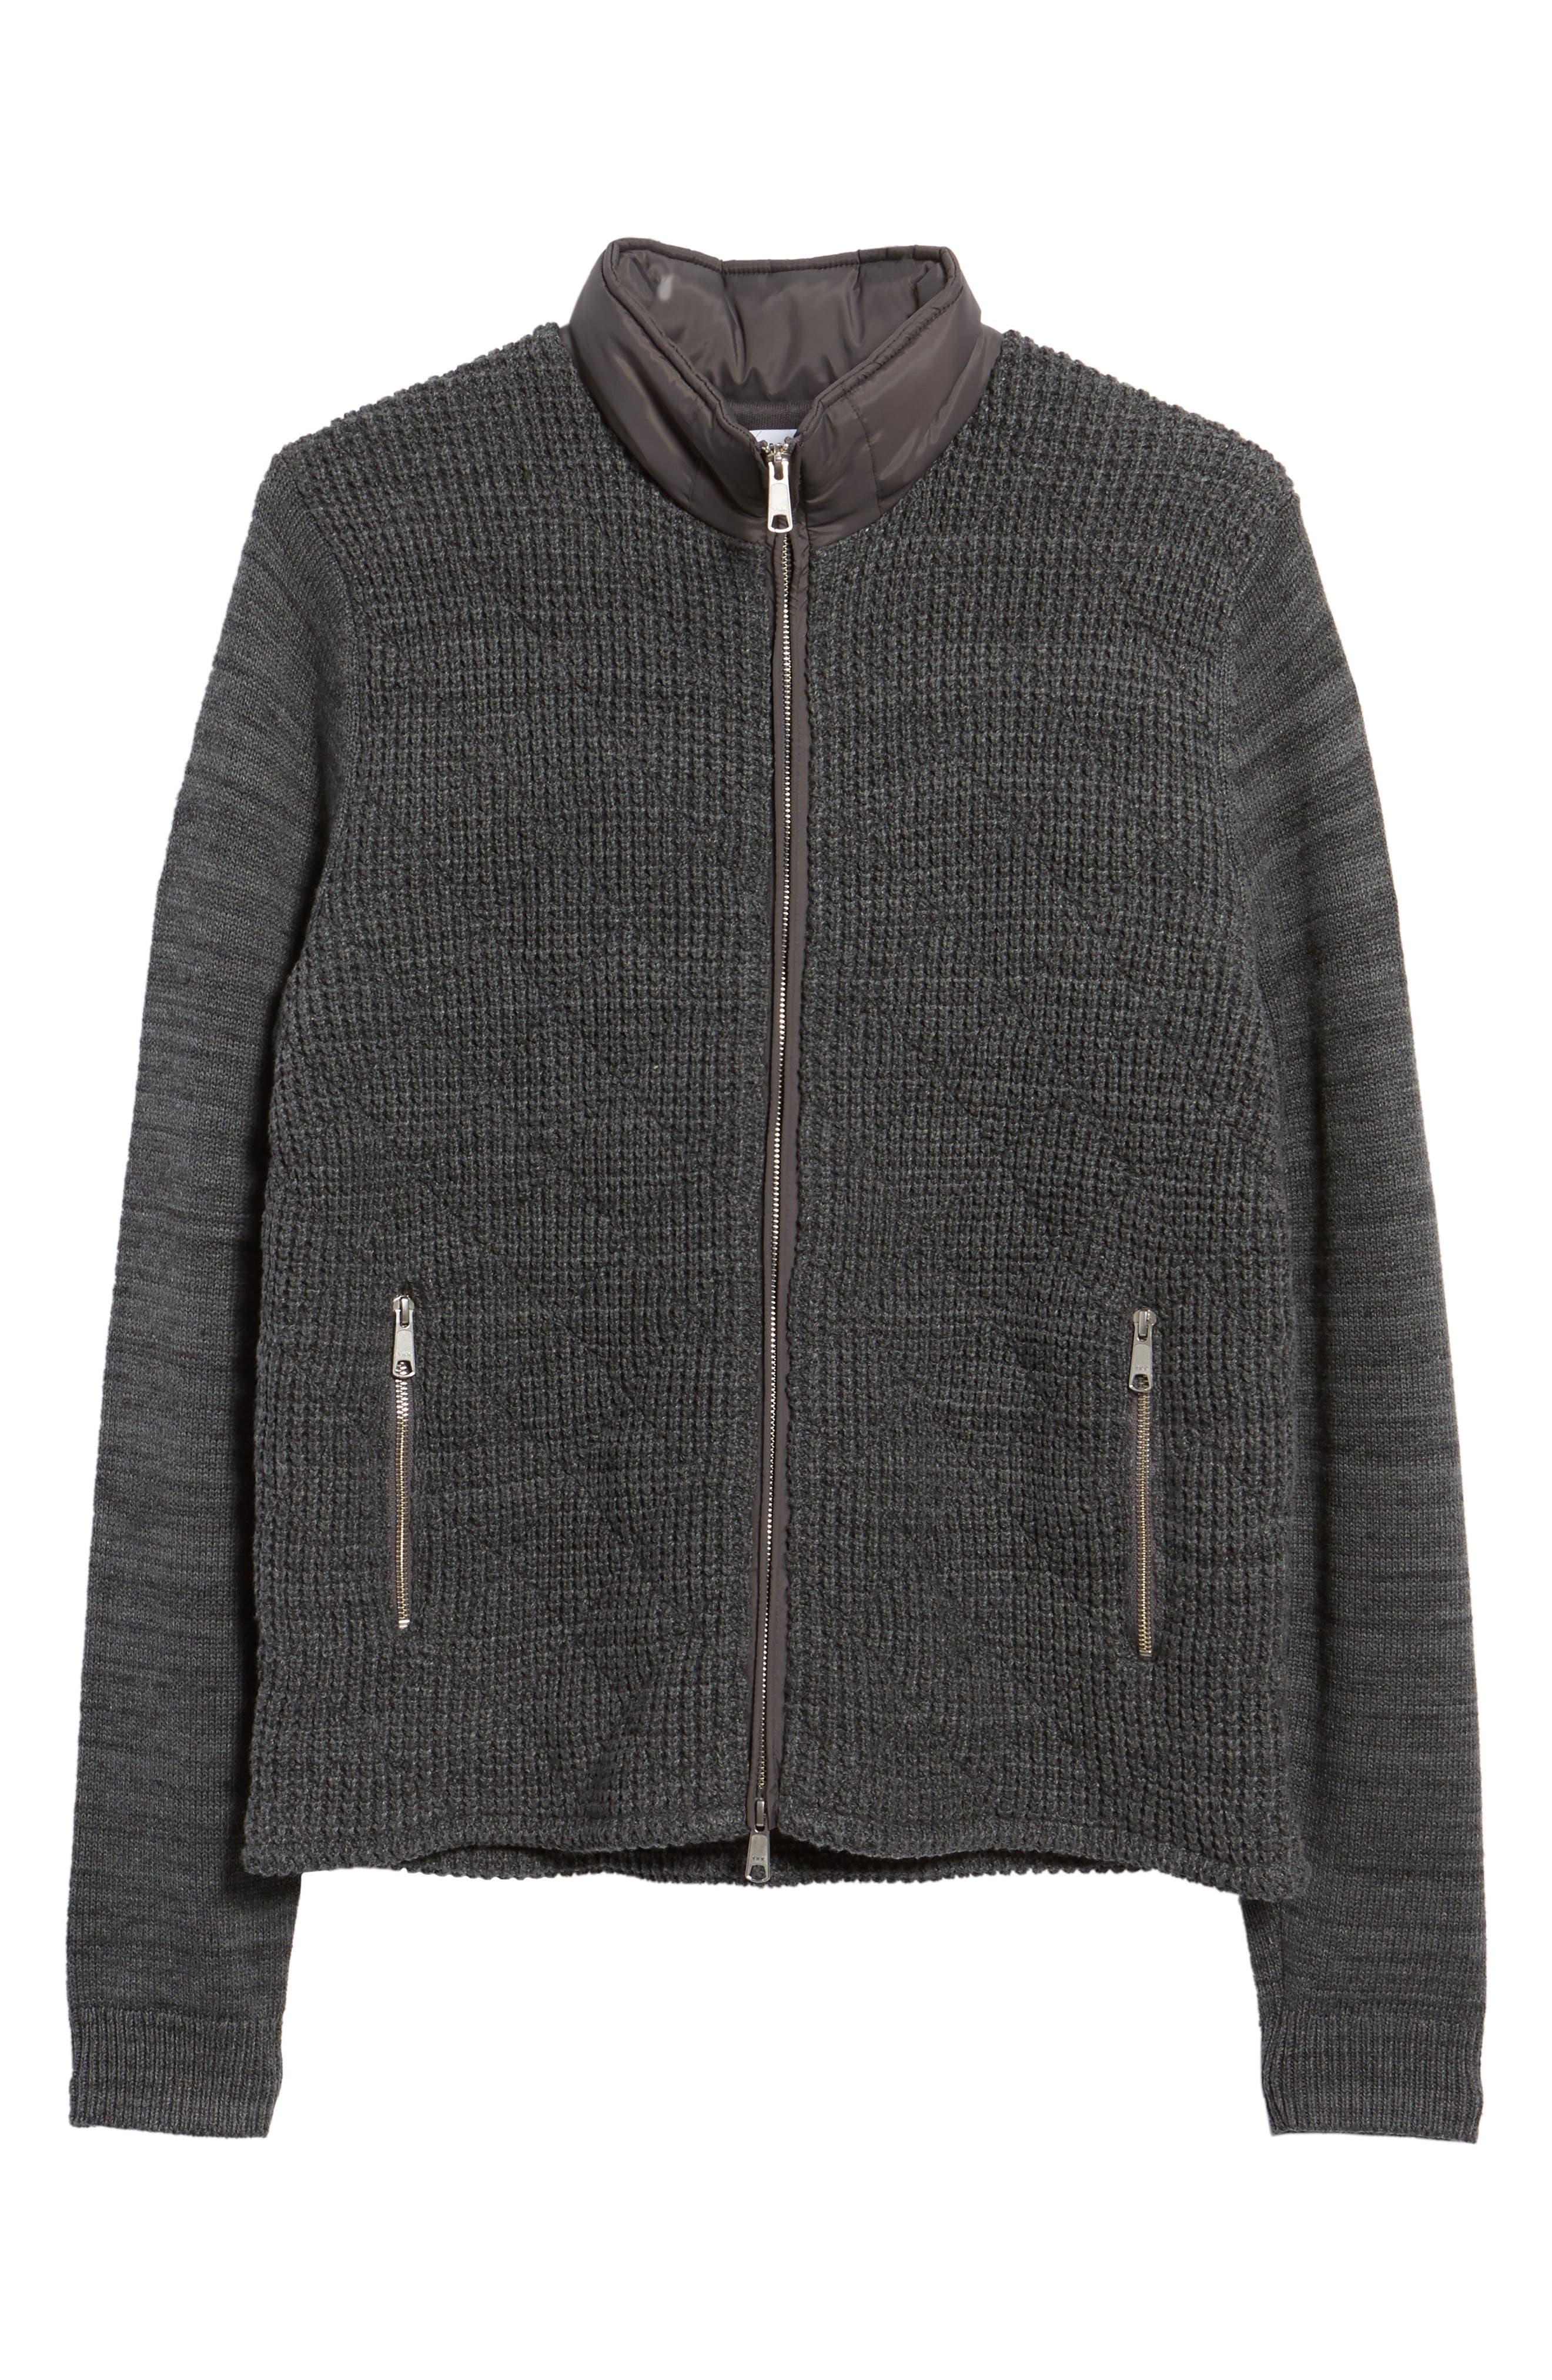 Mixed Media Full Zip Sweater,                             Alternate thumbnail 6, color,                             021